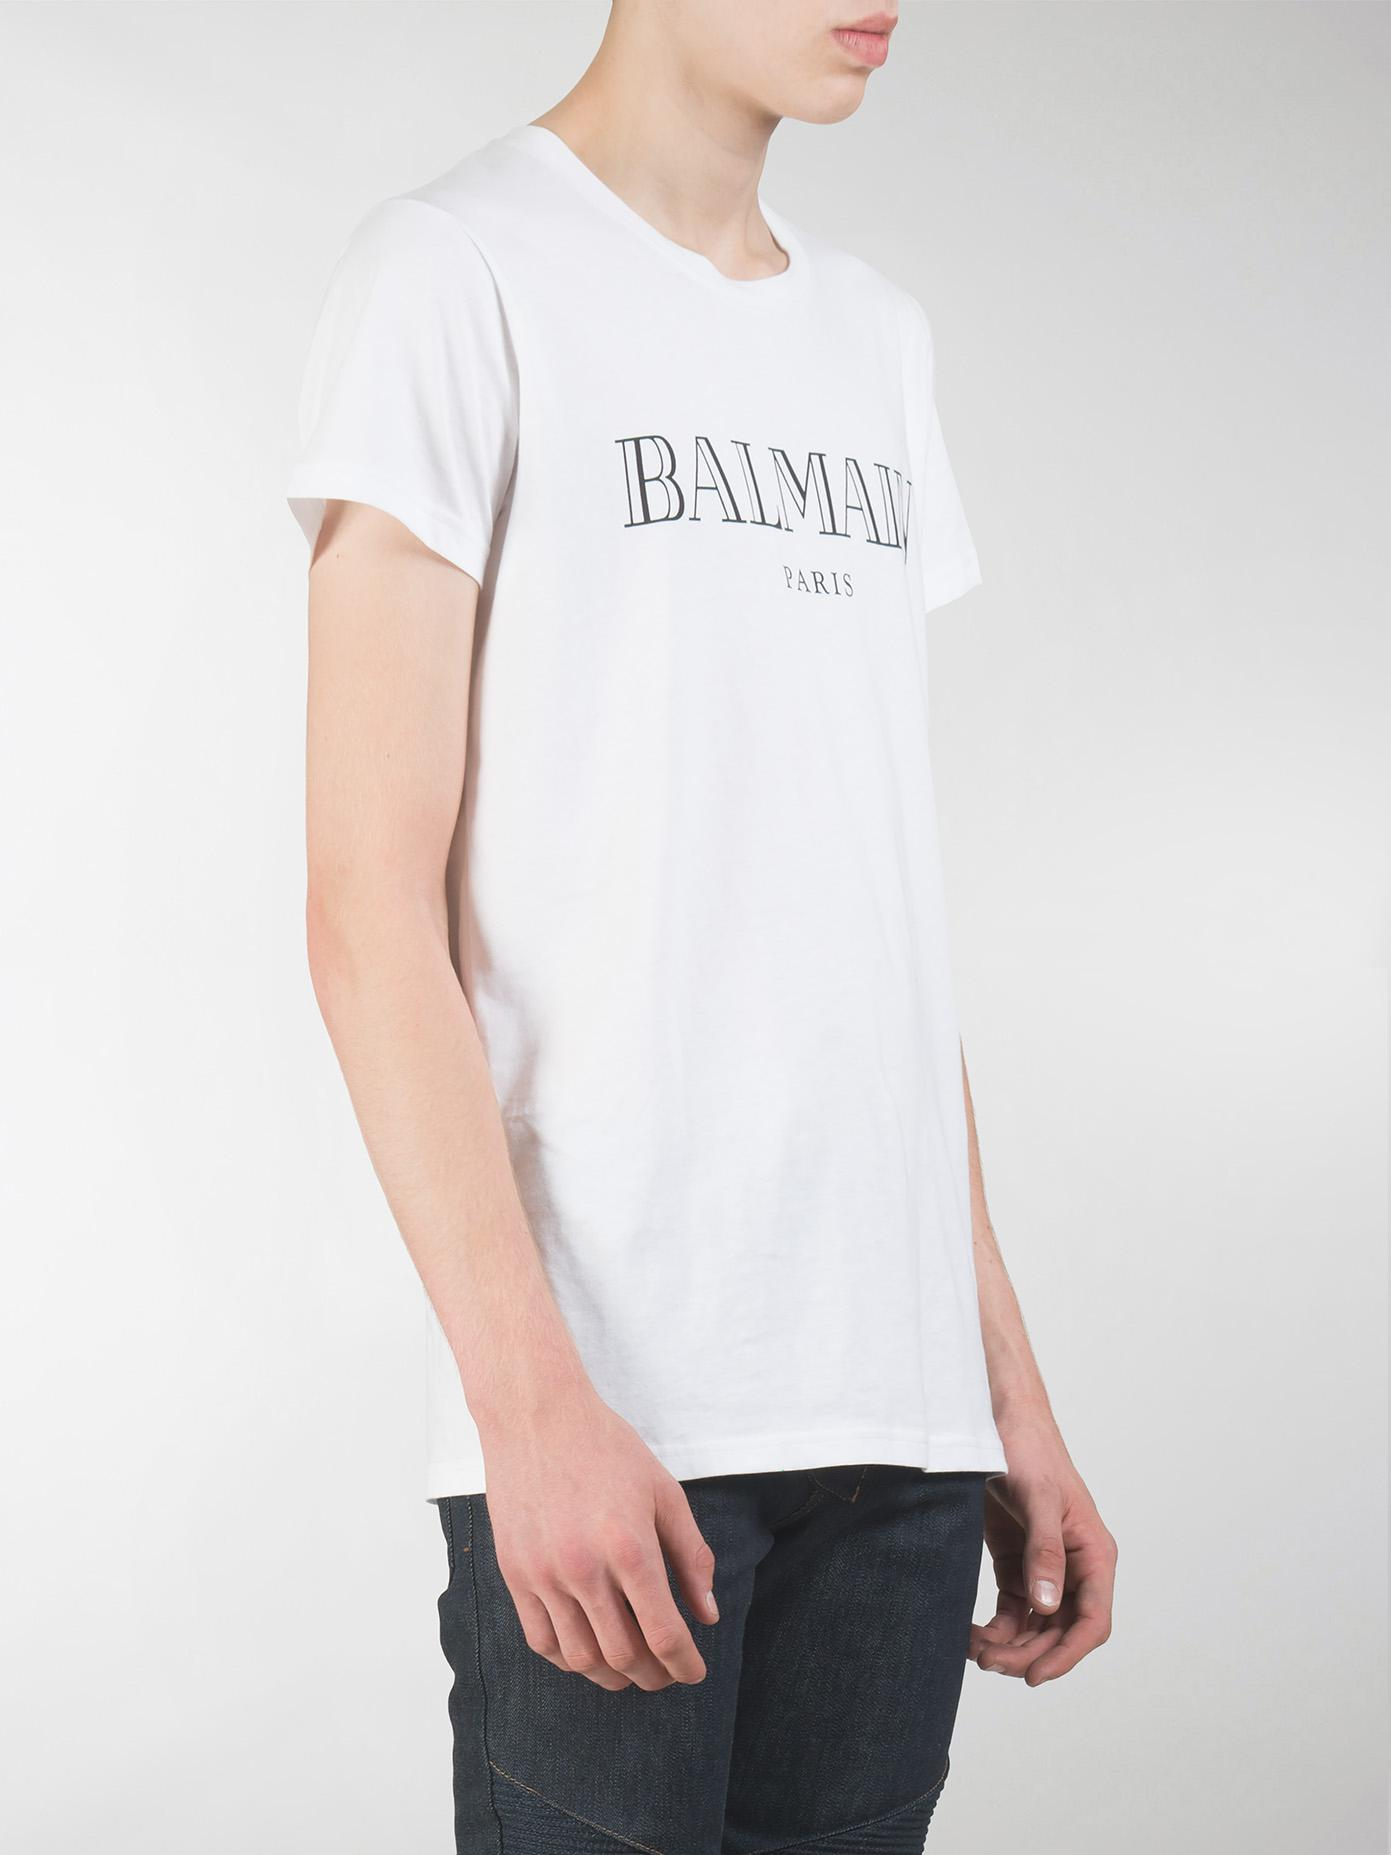 Lyst balmain tshirt blanc print paris noir in white for men for Balmain white logo t shirt